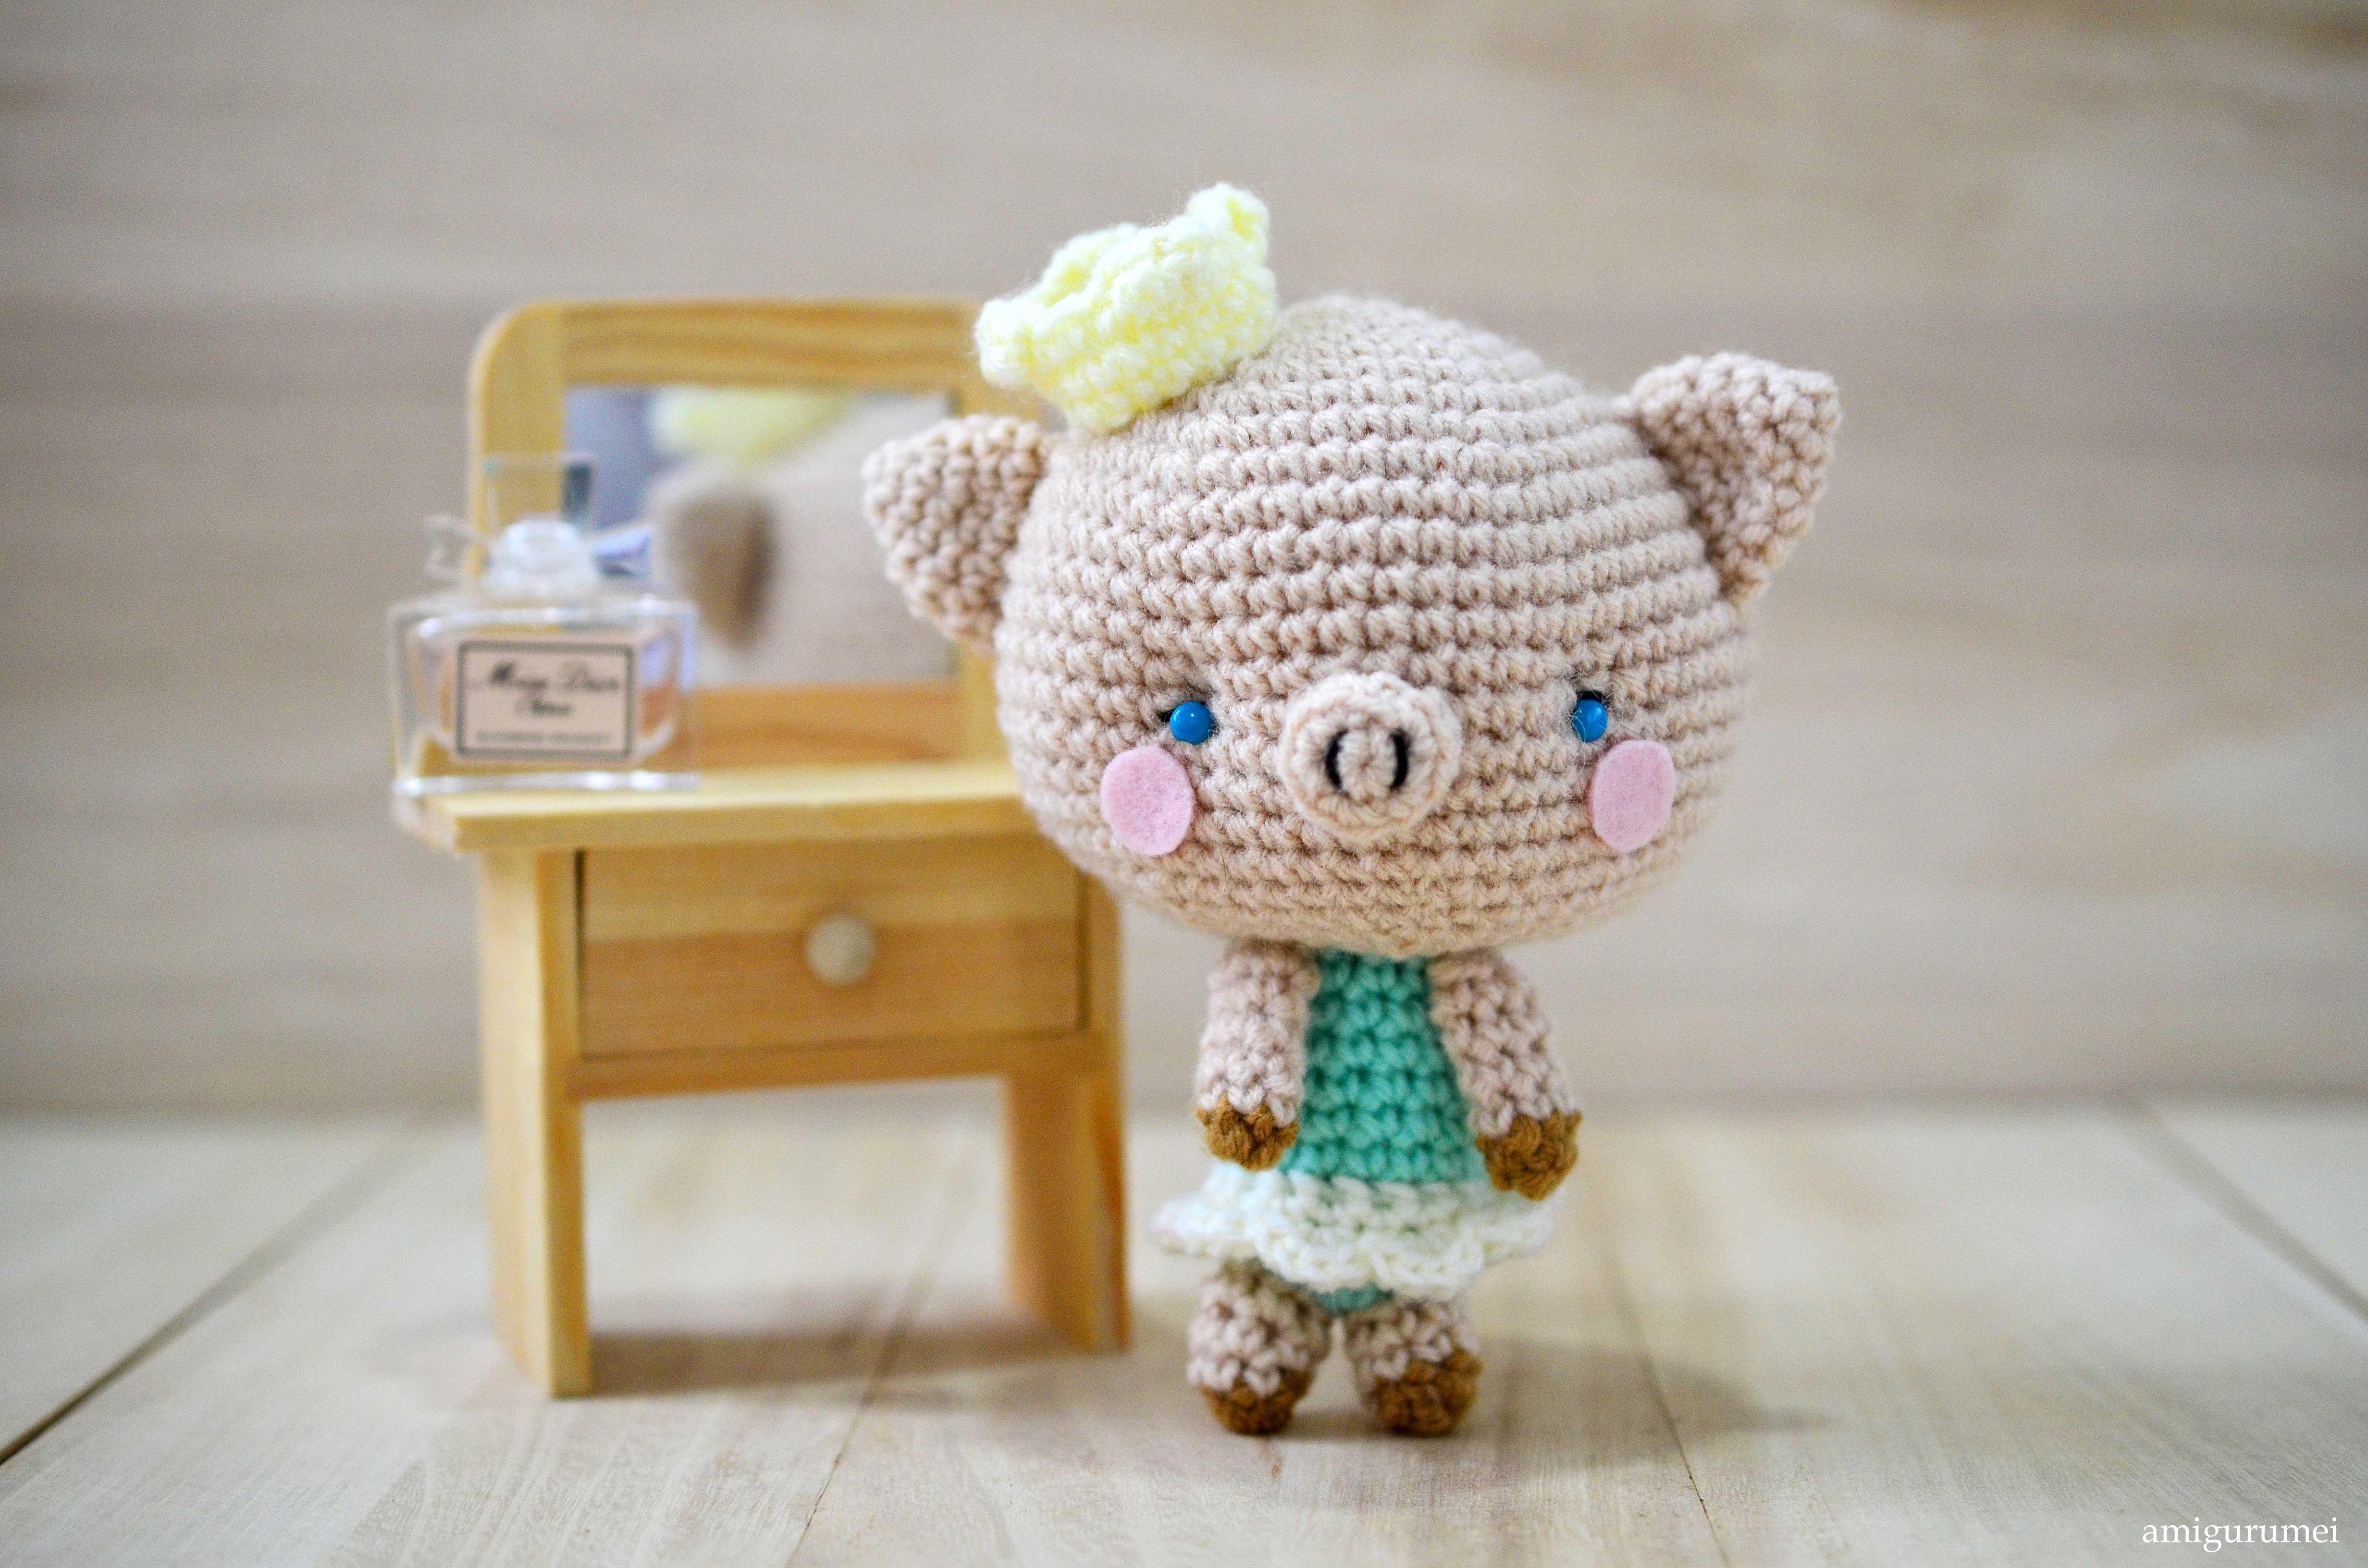 Free Amigurumi Princess Pattern : Free amigurumi pattern: Princess P amiguruMEI ??????